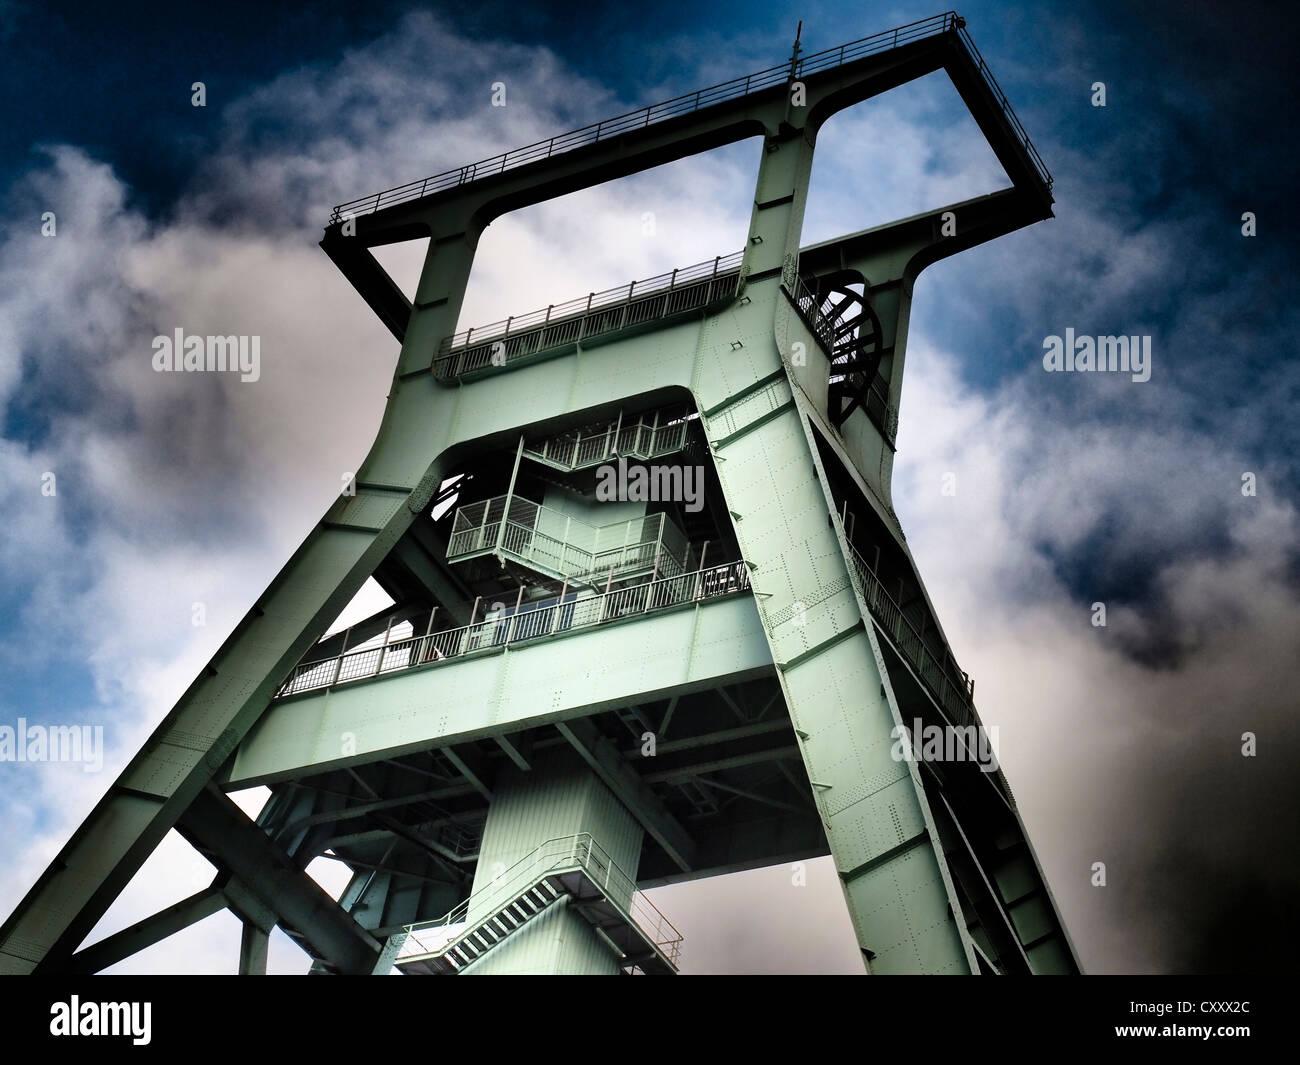 Headframe, German Mining Museum, storm clouds, Bochum, Ruhr region, North Rhine-Westphalia - Stock Image